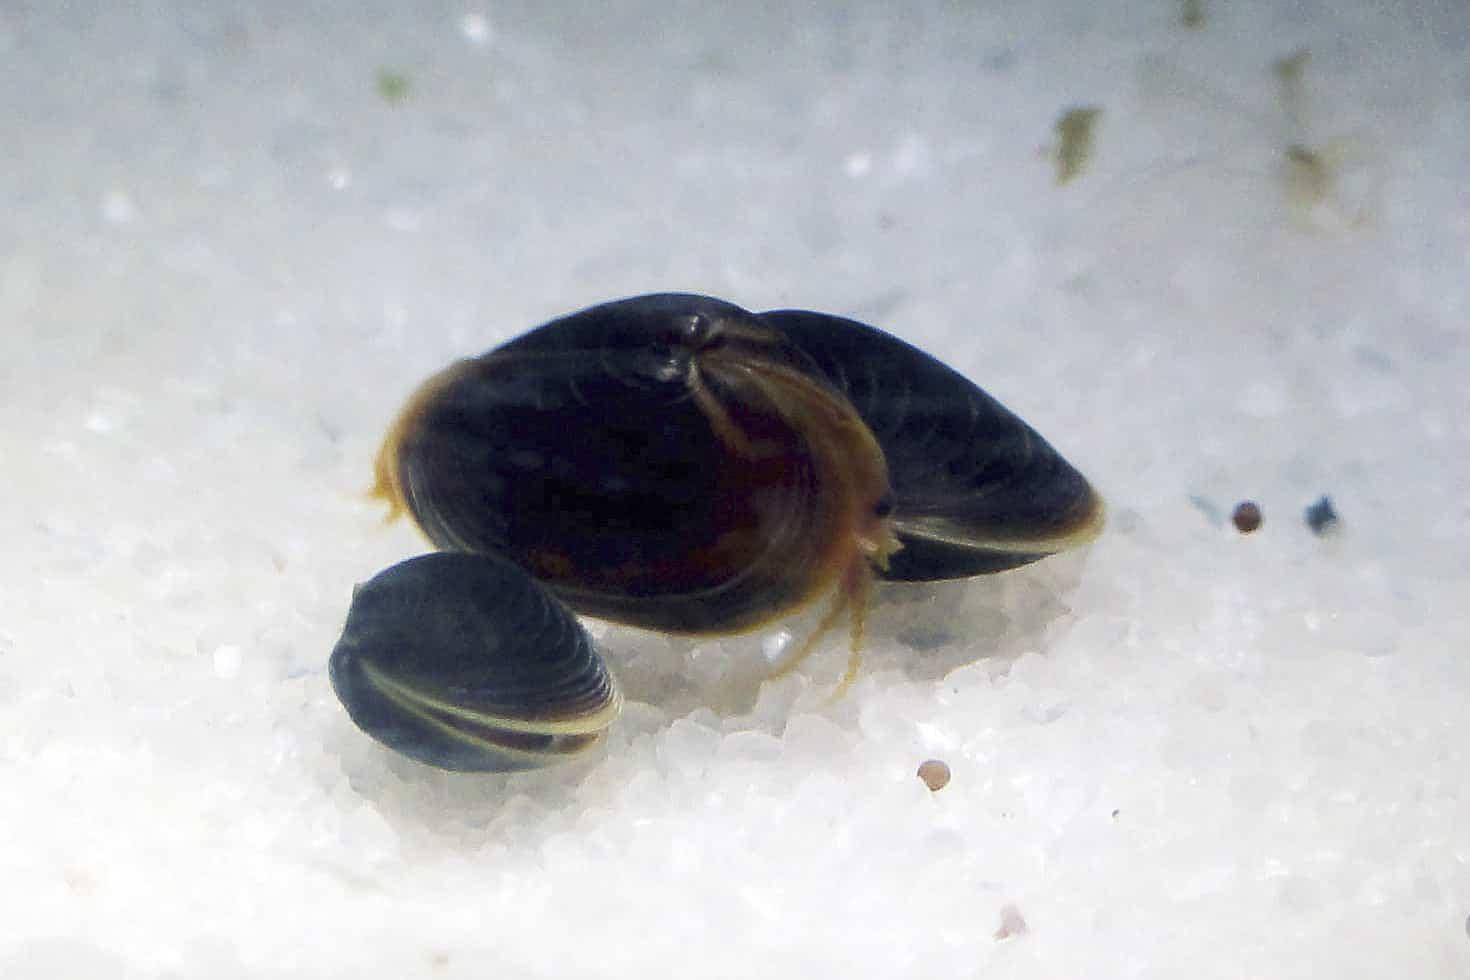 Cyzicus sp.